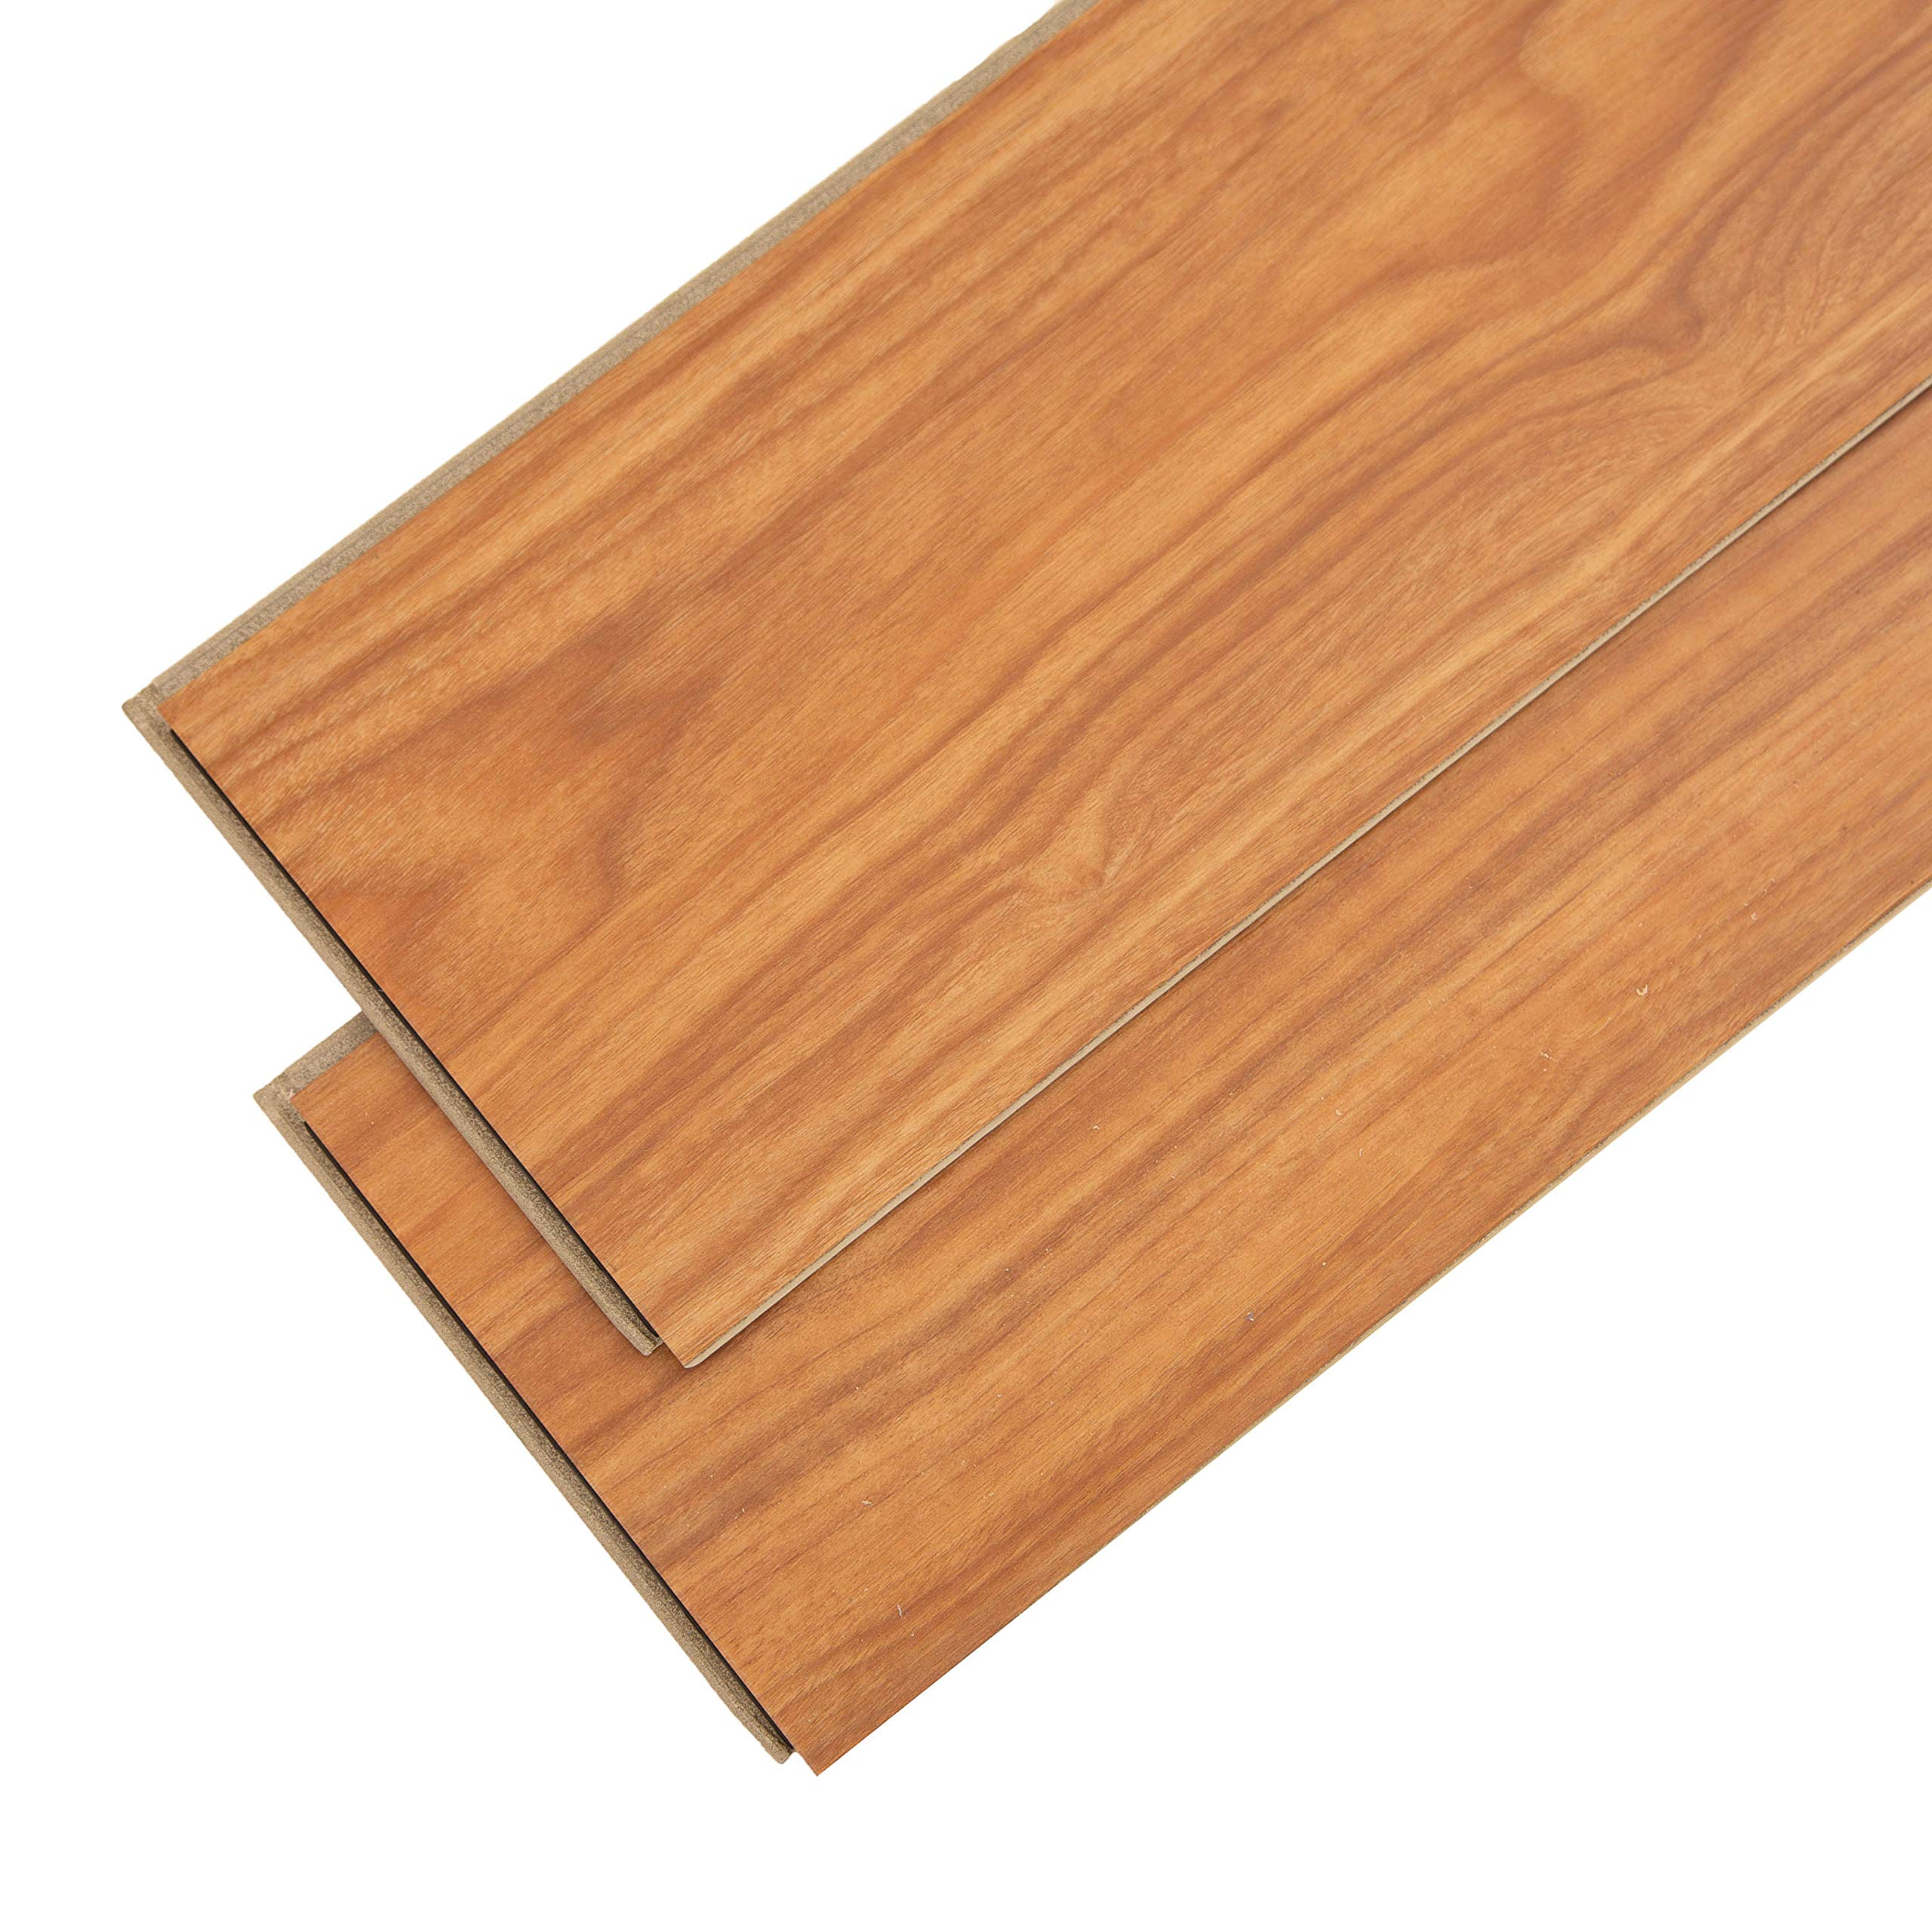 IncStores TritonCORE 7'' Waterproof Vinyl Planks 7'' x 48'' Planks (5 Cases - 50 Planks (583.35 Sqft), European Acacia)